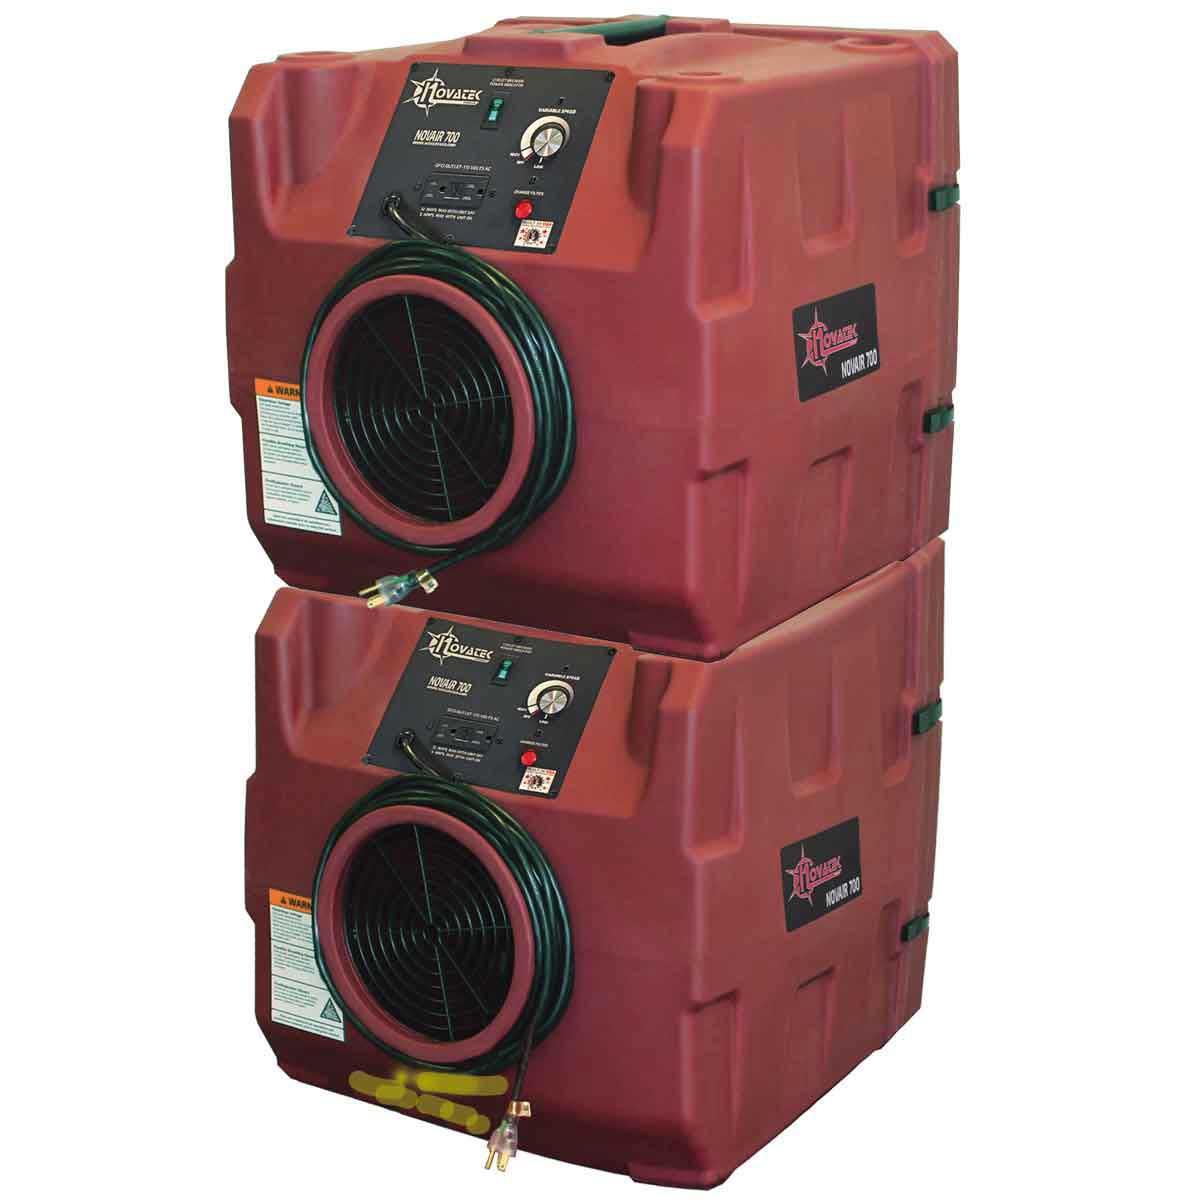 Stackable Novair 700 Air Purifier with Hepa Filter